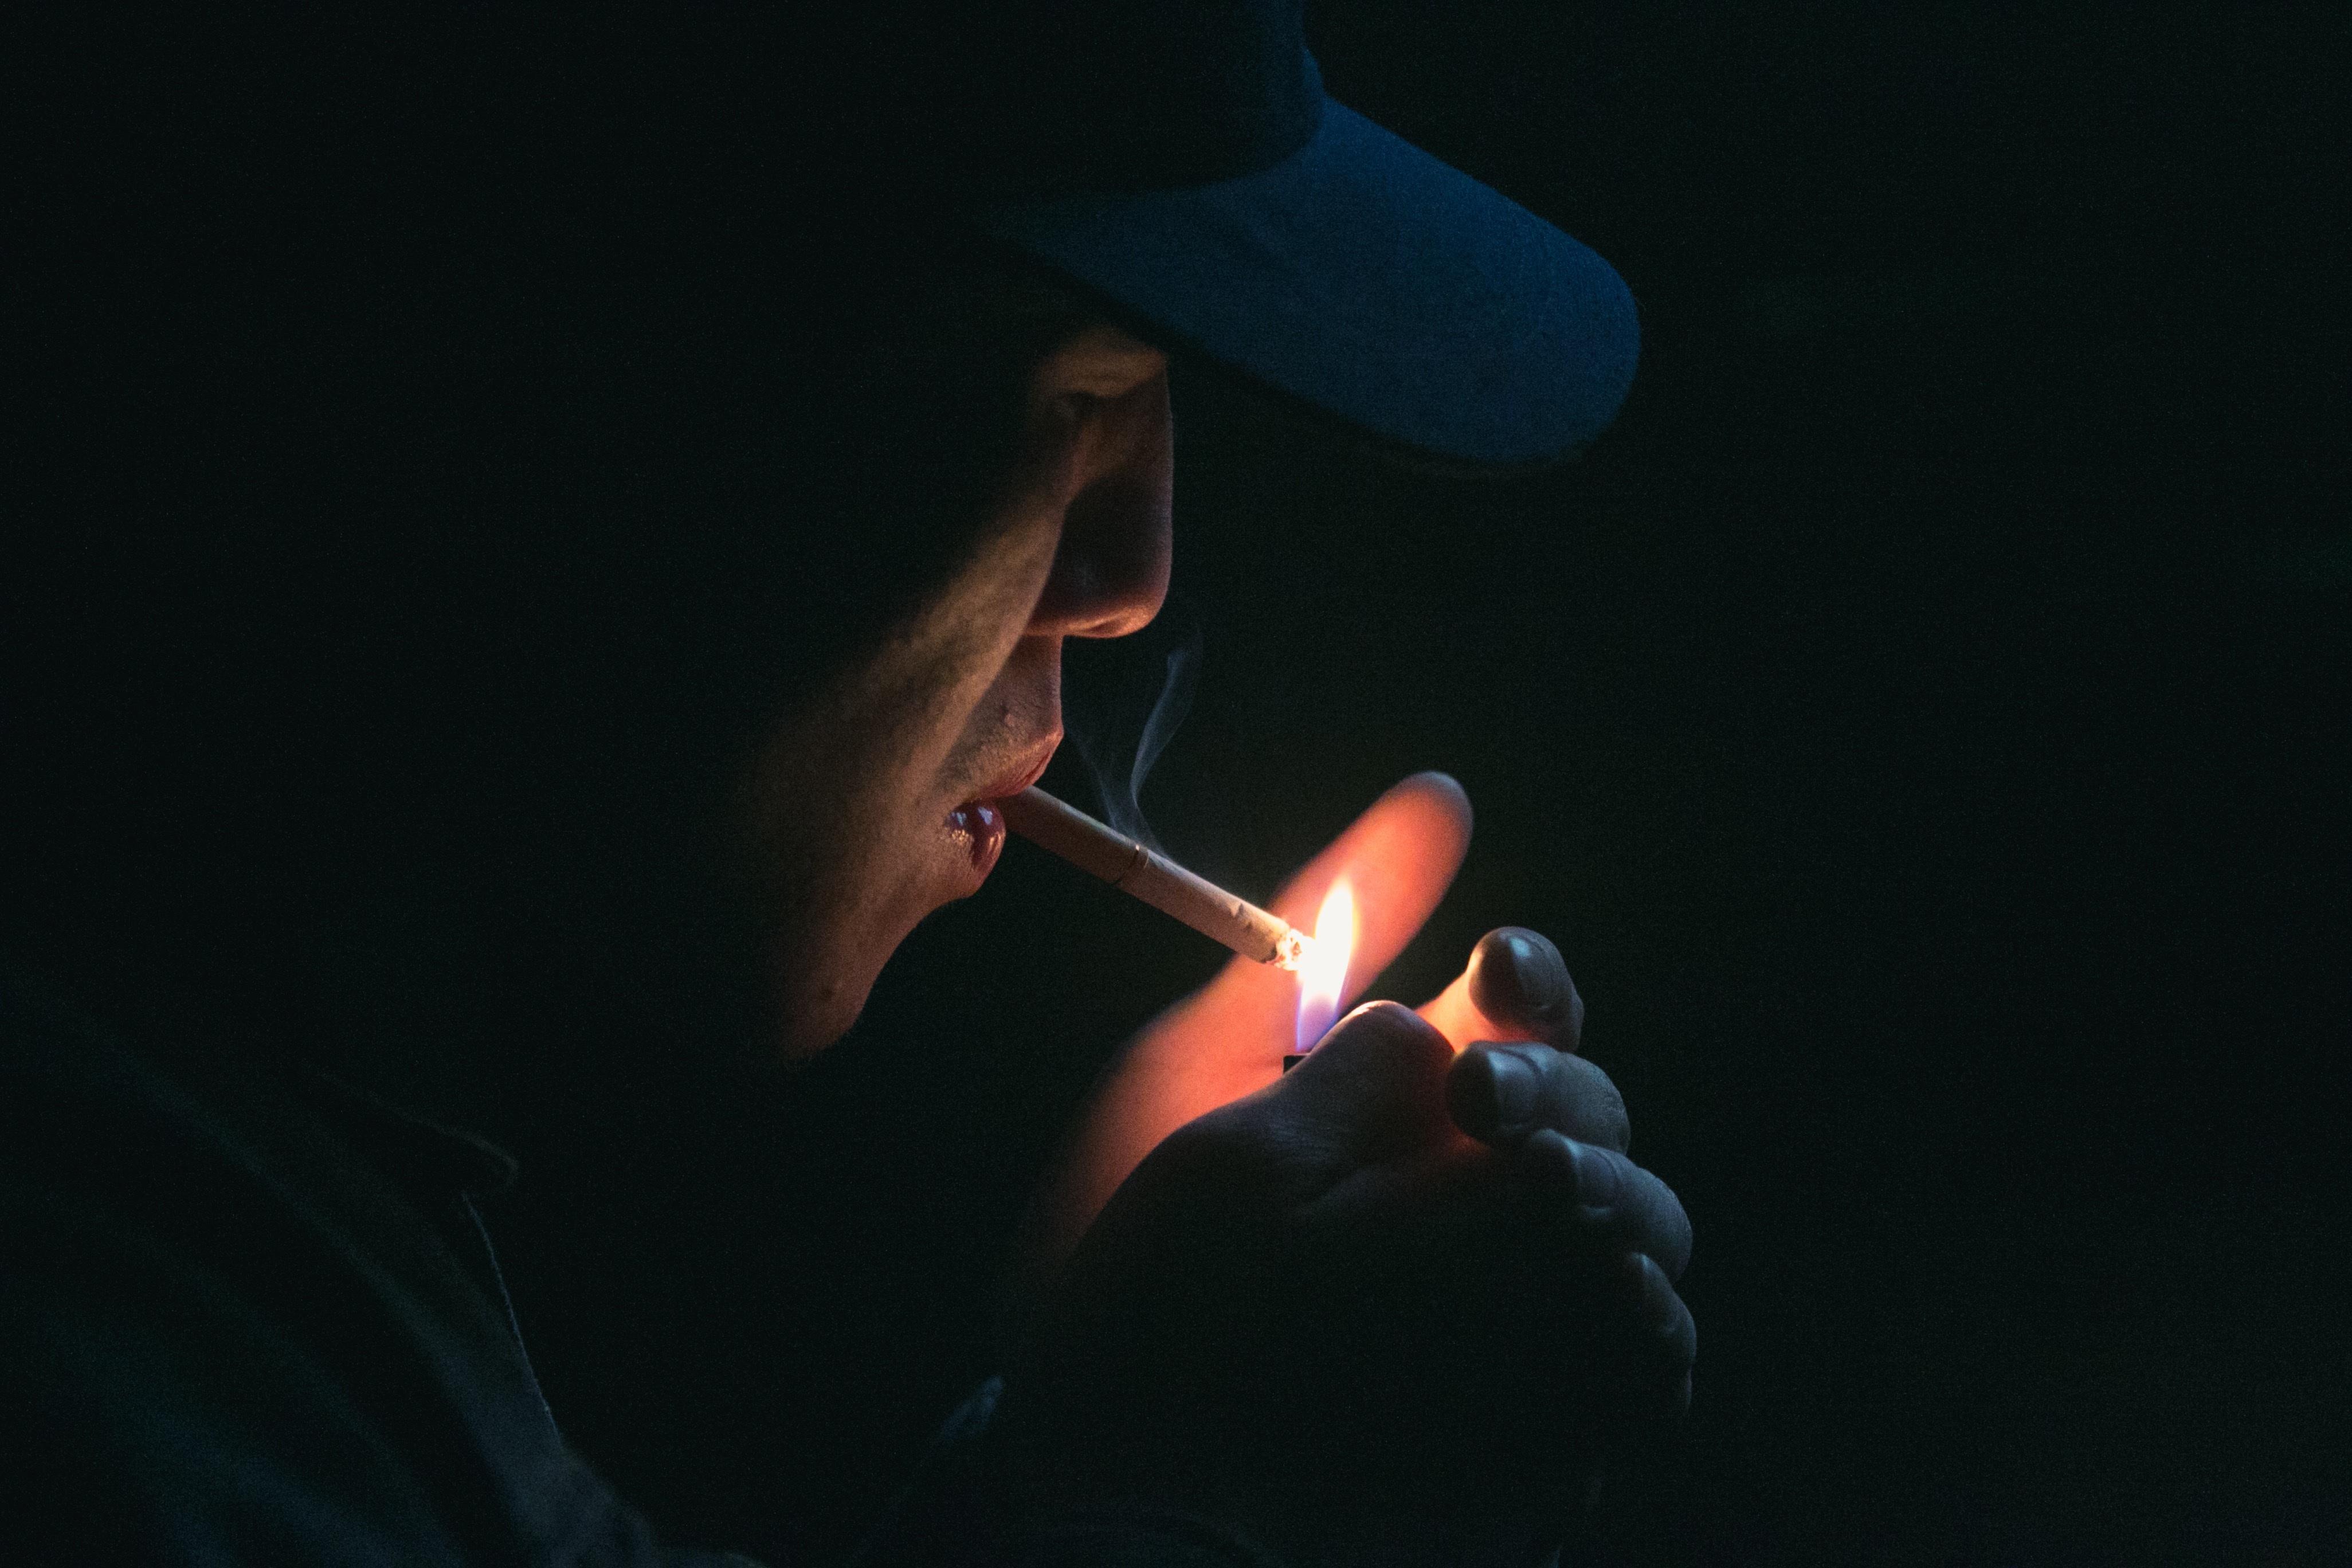 картинки мужчина с зажигалкой шанцев смог